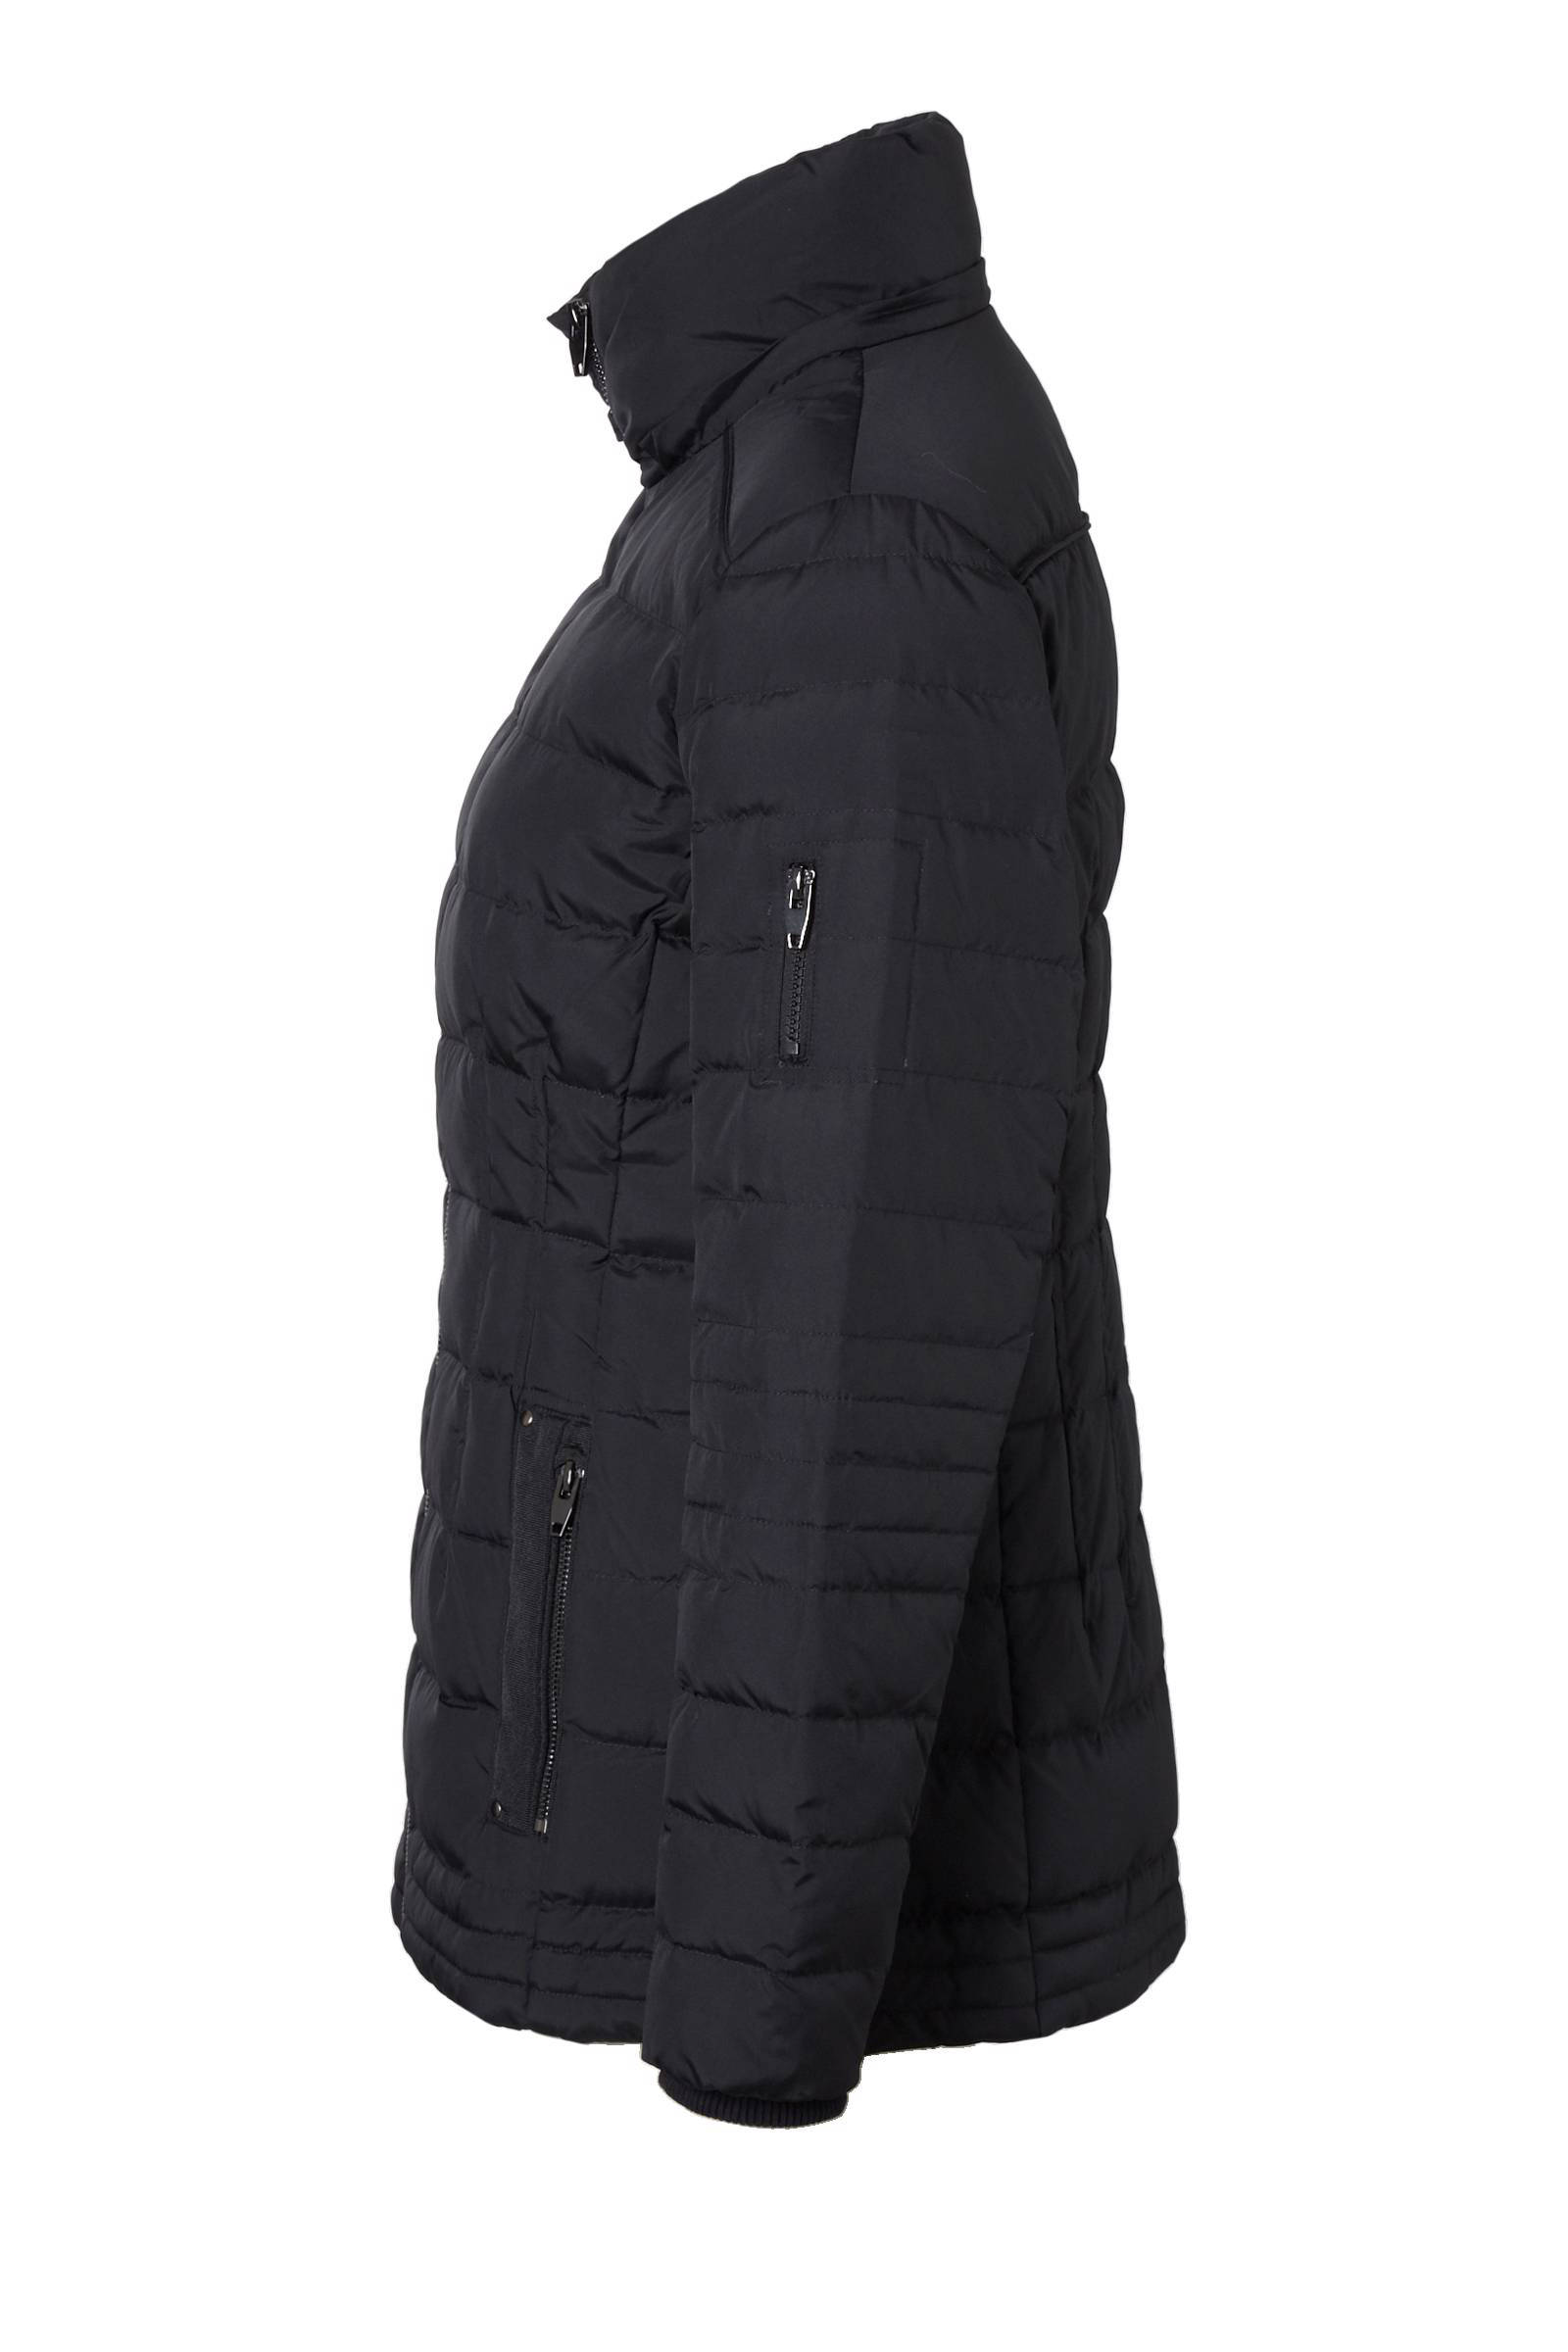 ESPRIT Women Casual winterjas | wehkamp